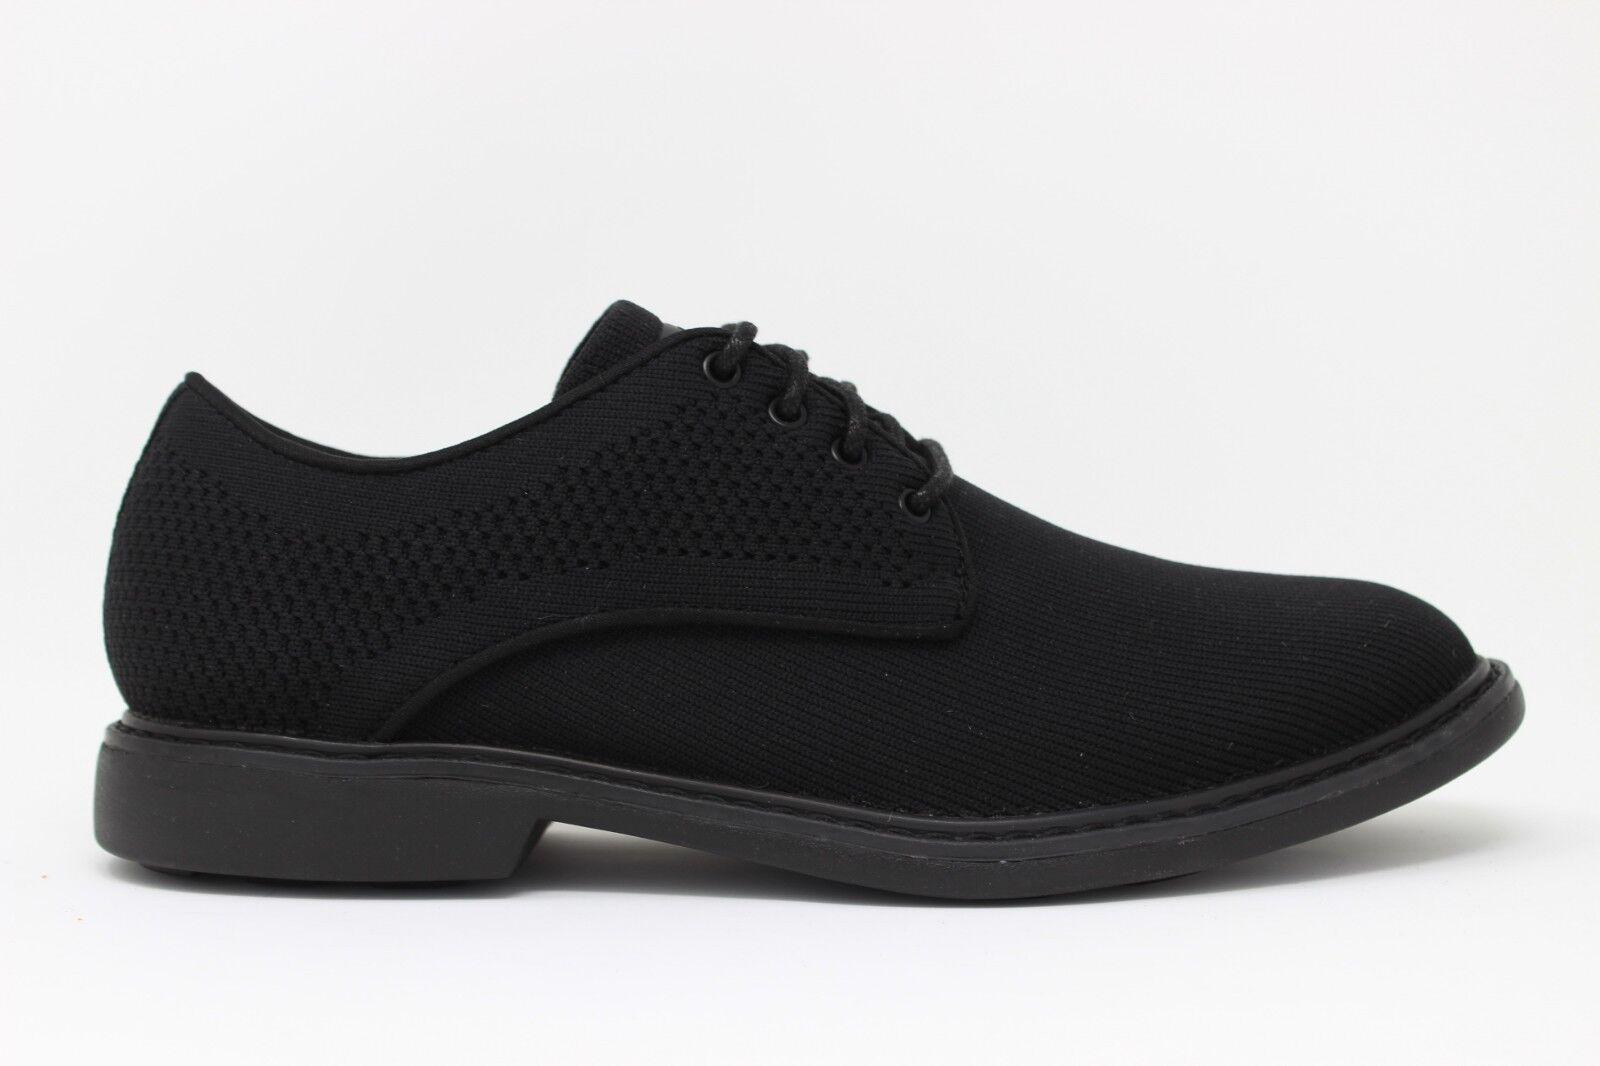 Skechers Men's Mark Nason Maas 68254 B Black Brand New In Box